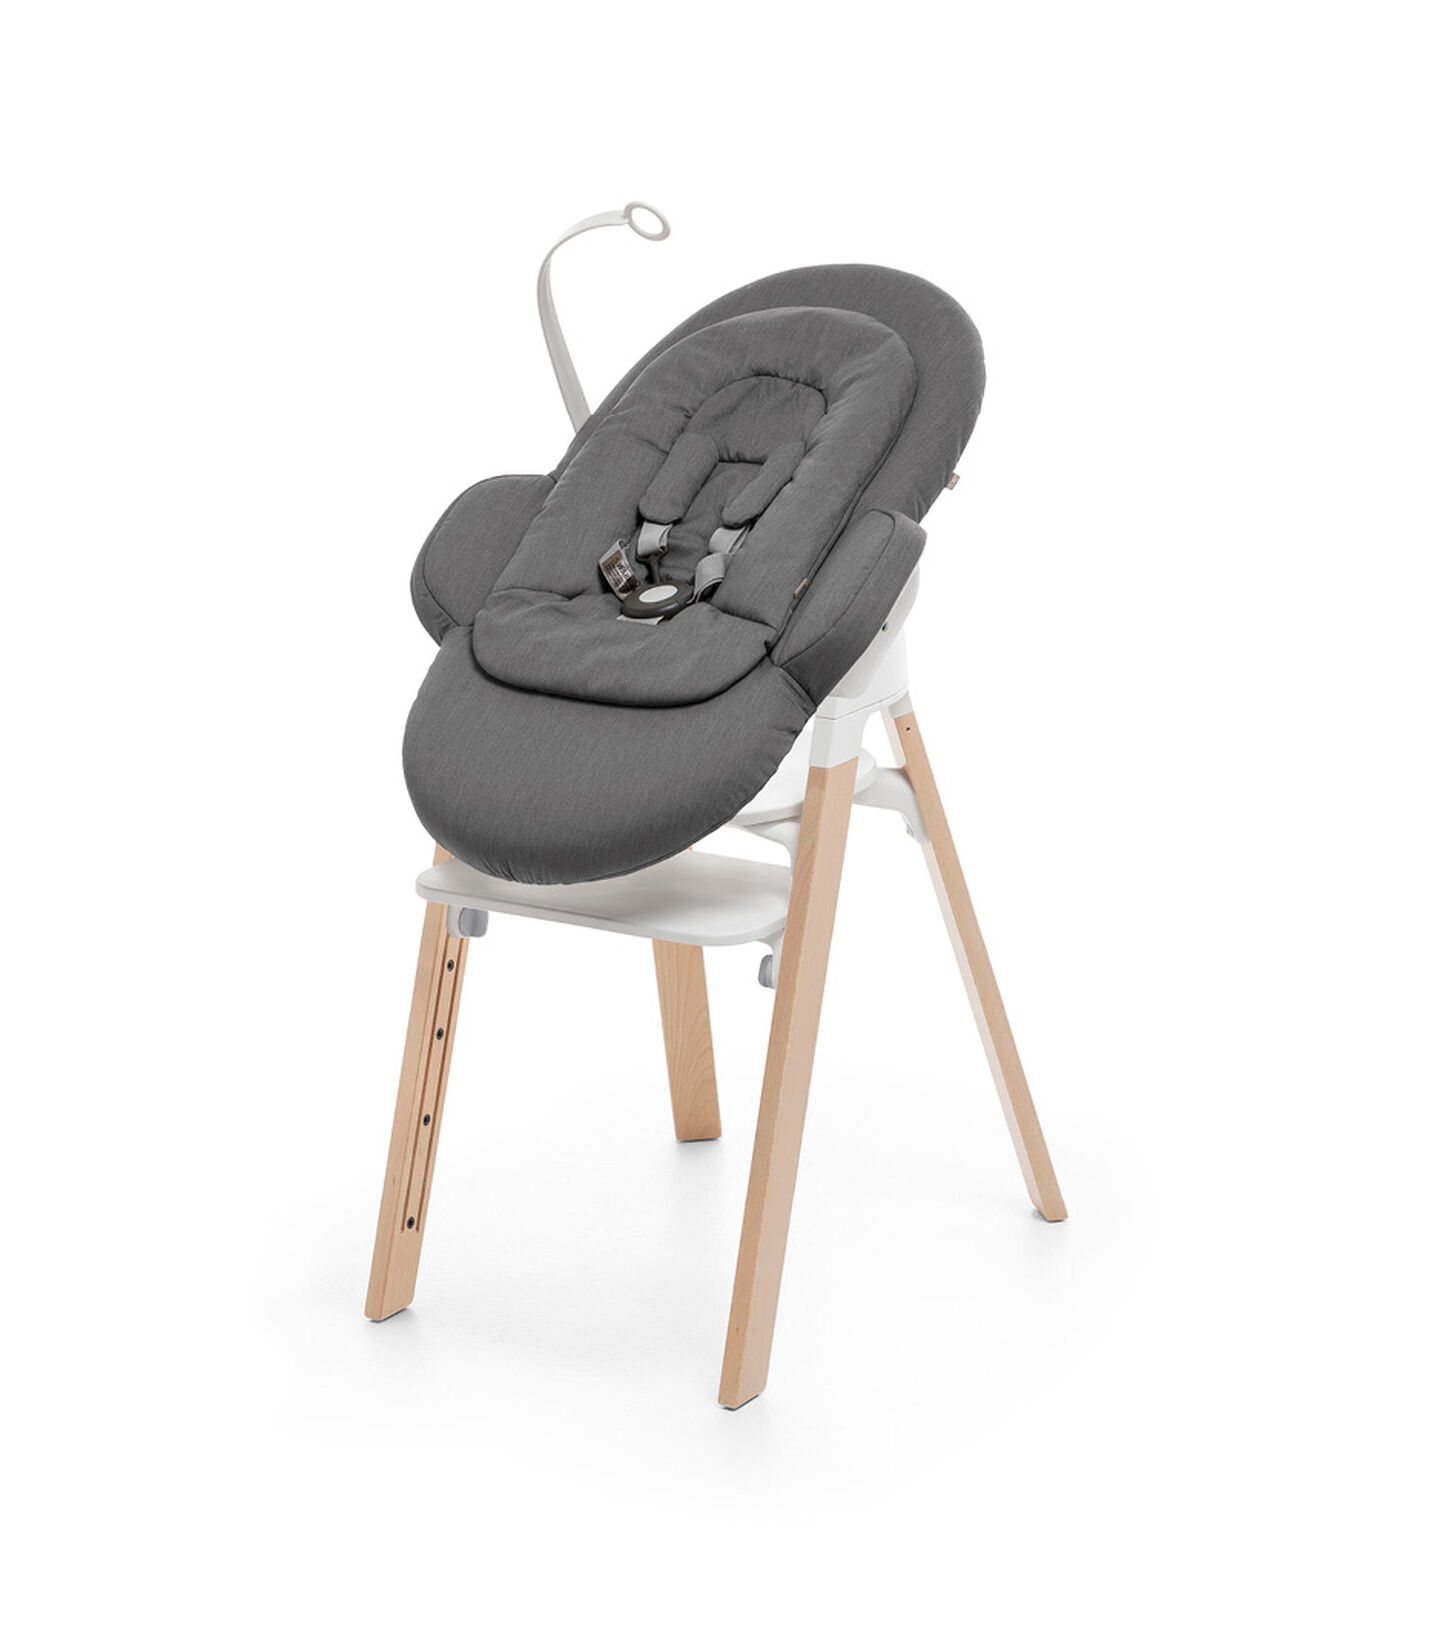 "Stokke® Steps"" Chair, Beech Natural, with Newborn Set Deep Grey. view 1"